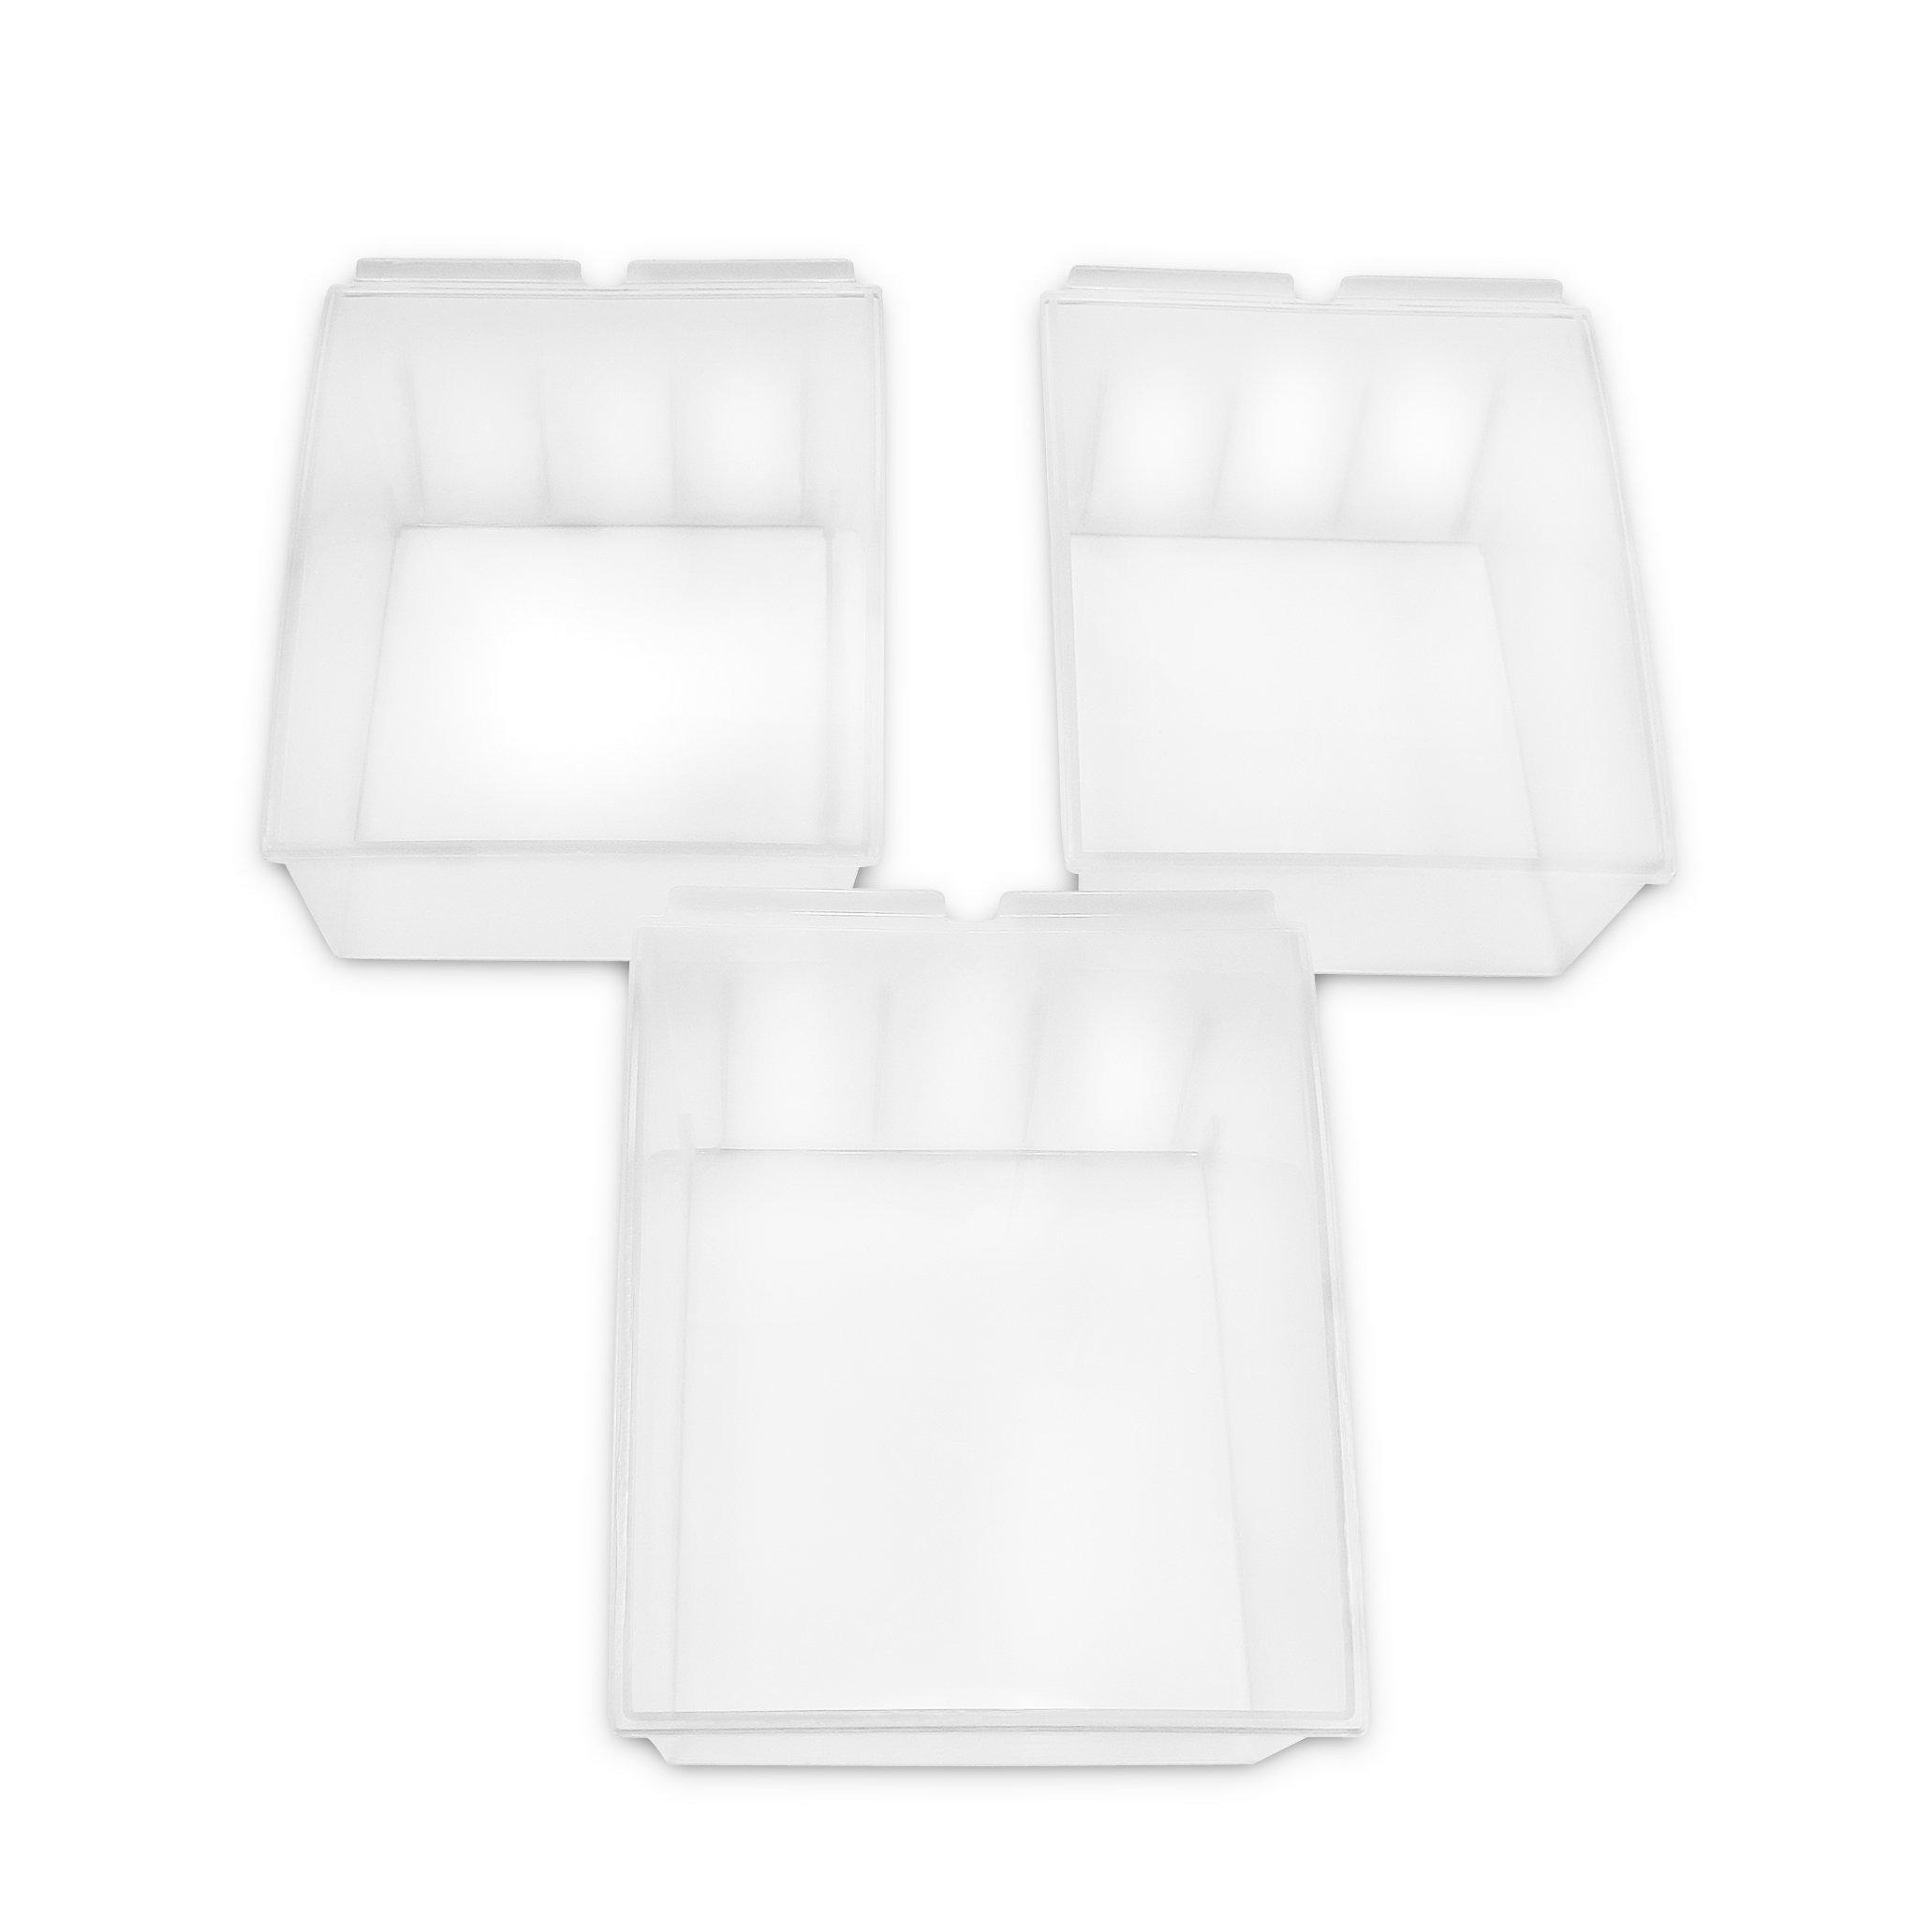 Proslat 3230 Probin Storage Bin Designed for PVC Slatwall, Large, 3-Pack